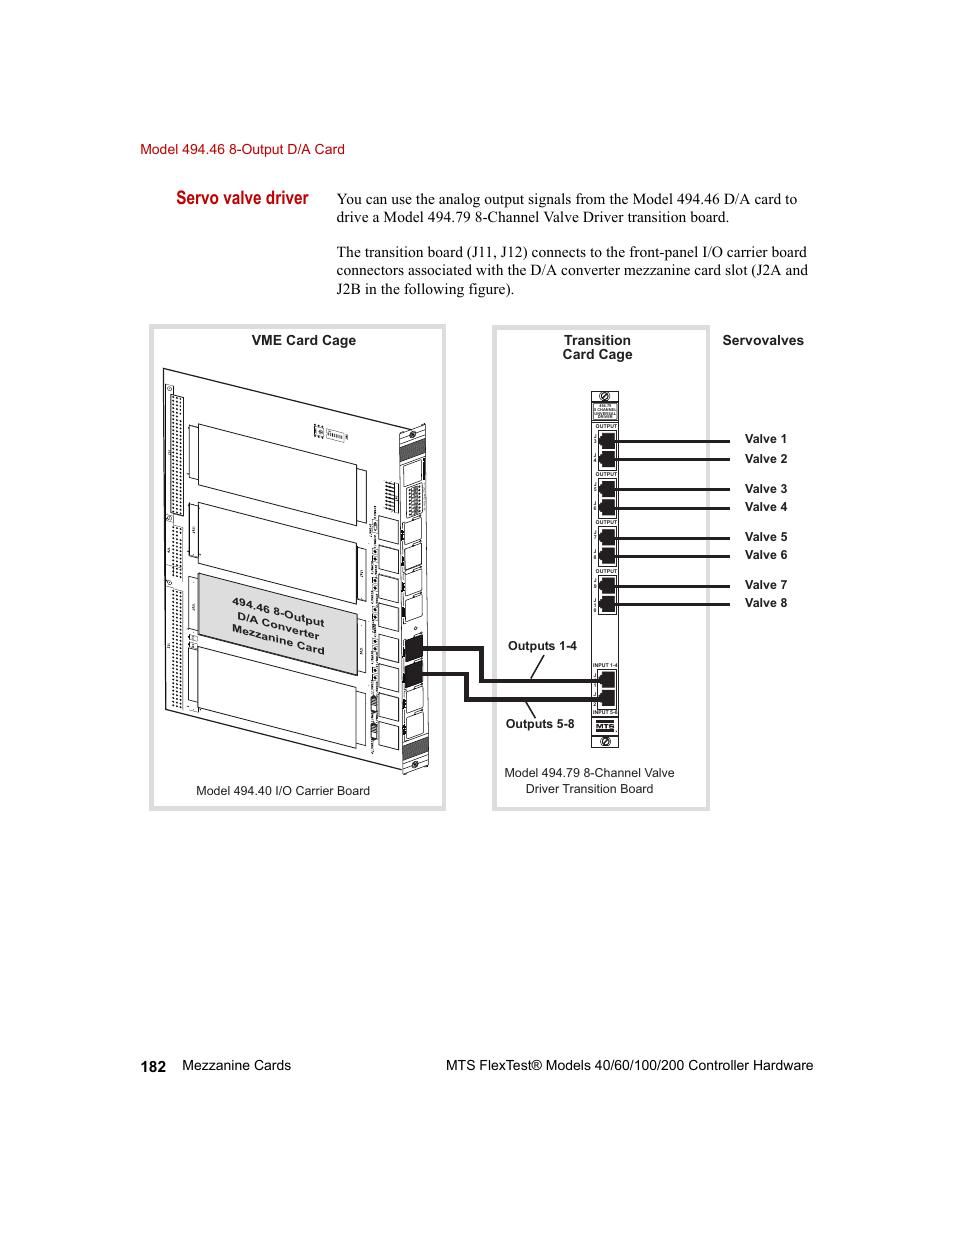 Servo valve driver, Transition card cage vme card cage